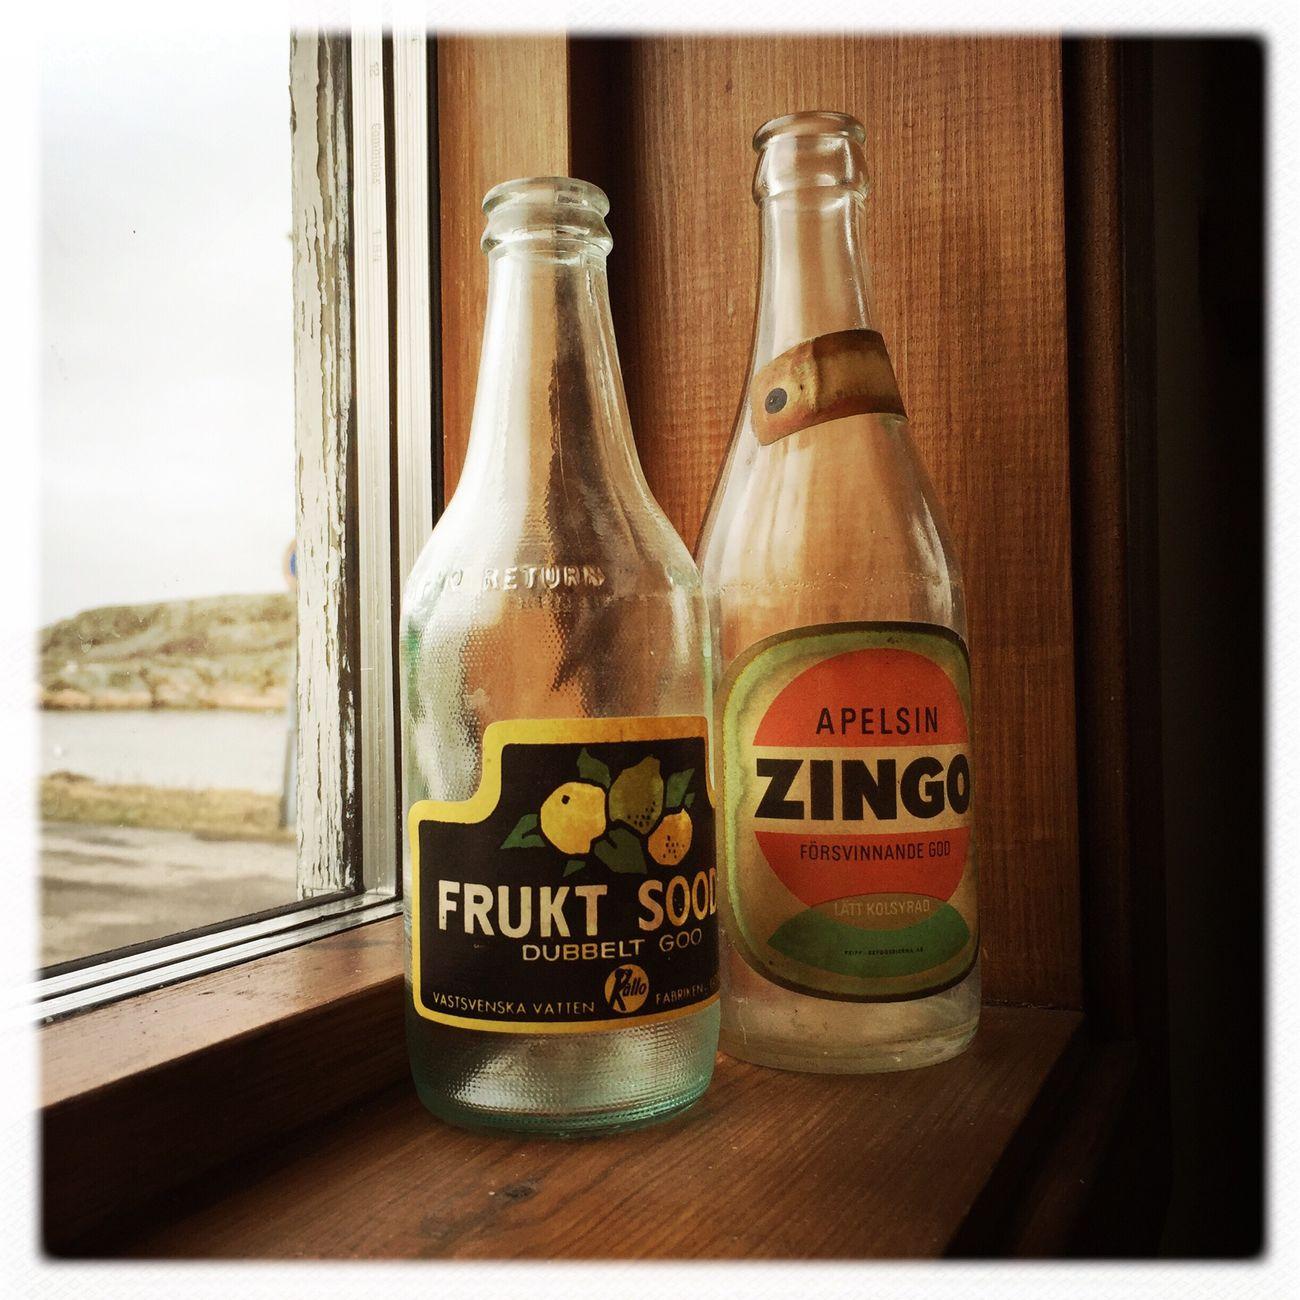 Pripps Frukt Sooda Zingo Apelsin Källofabriken Goteborg Dricka Hipstamatic Sweden Iphone6plus